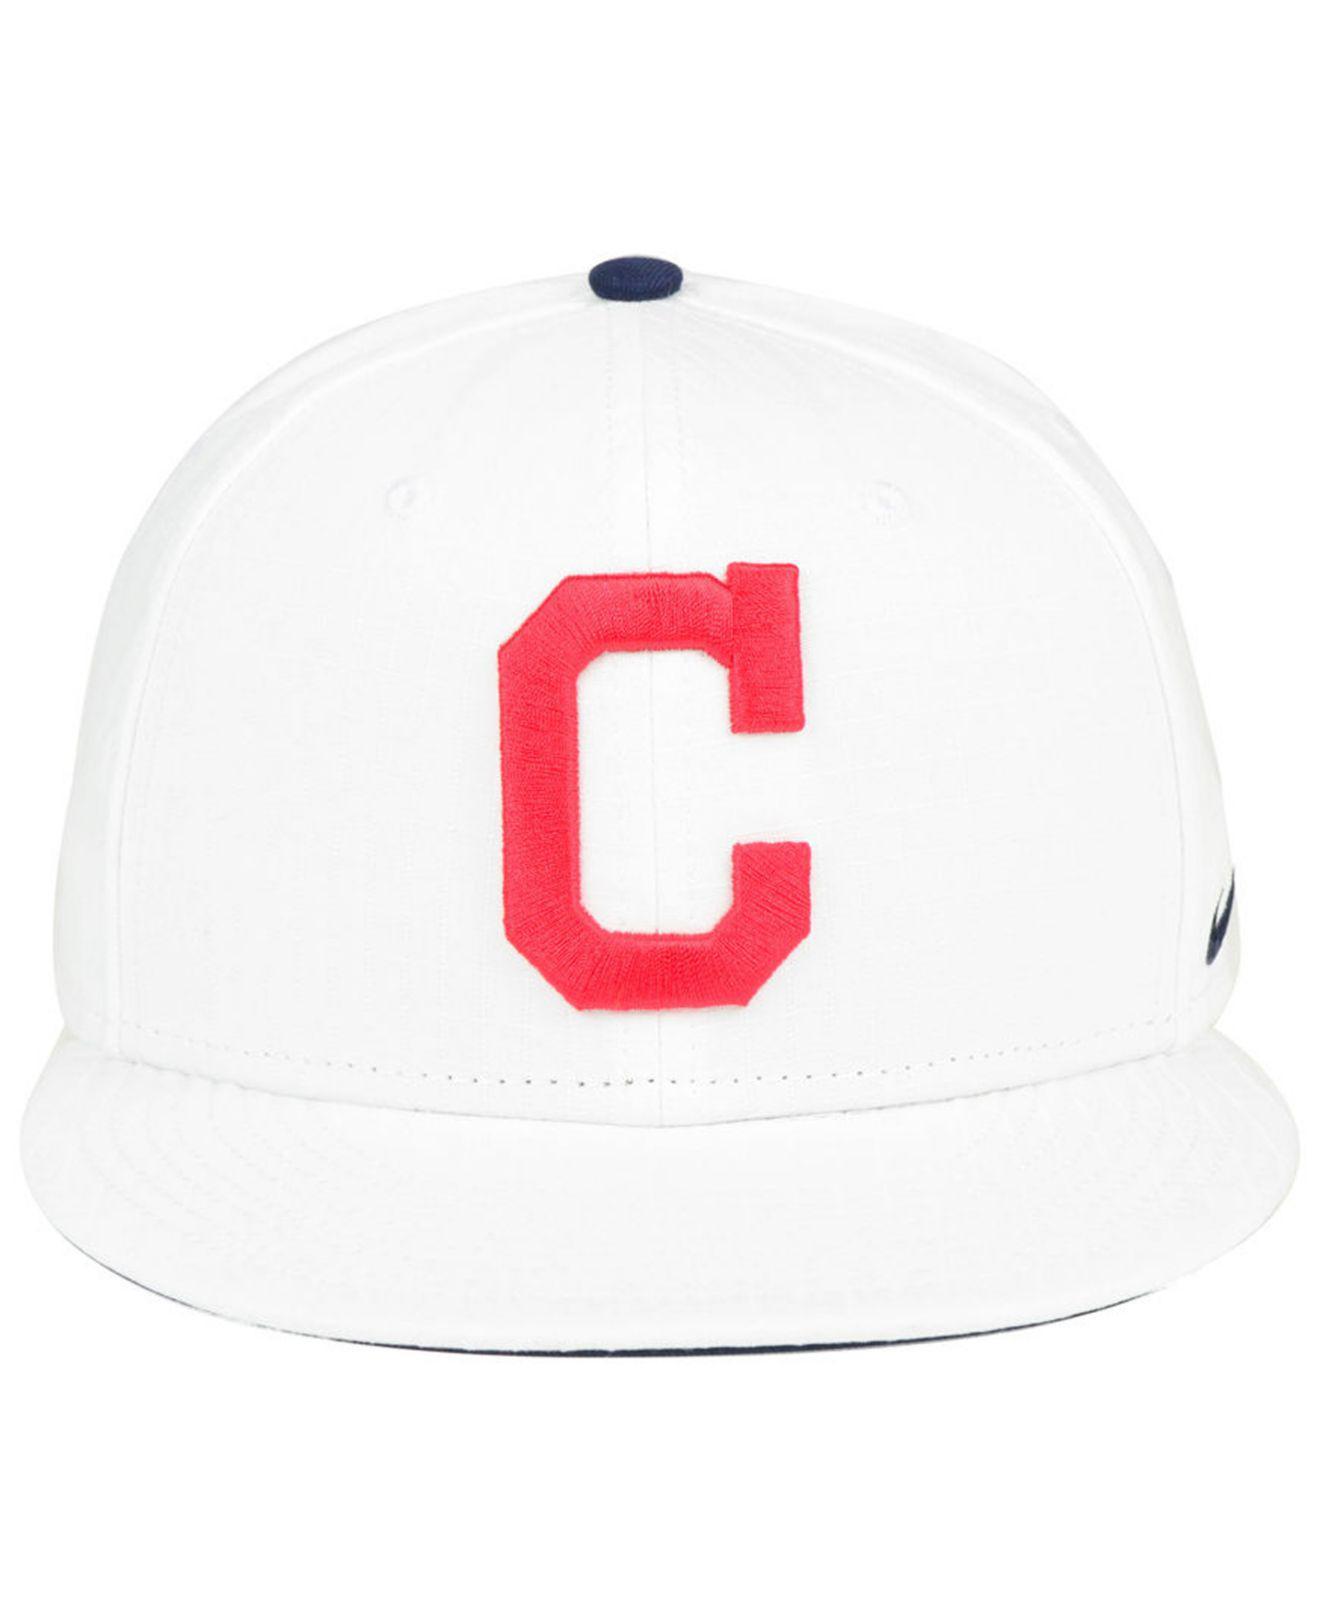 best service 3c069 de167 ... cheap lyst nike cleveland indians white ripstop snapback cap in white  for men a442e e910a